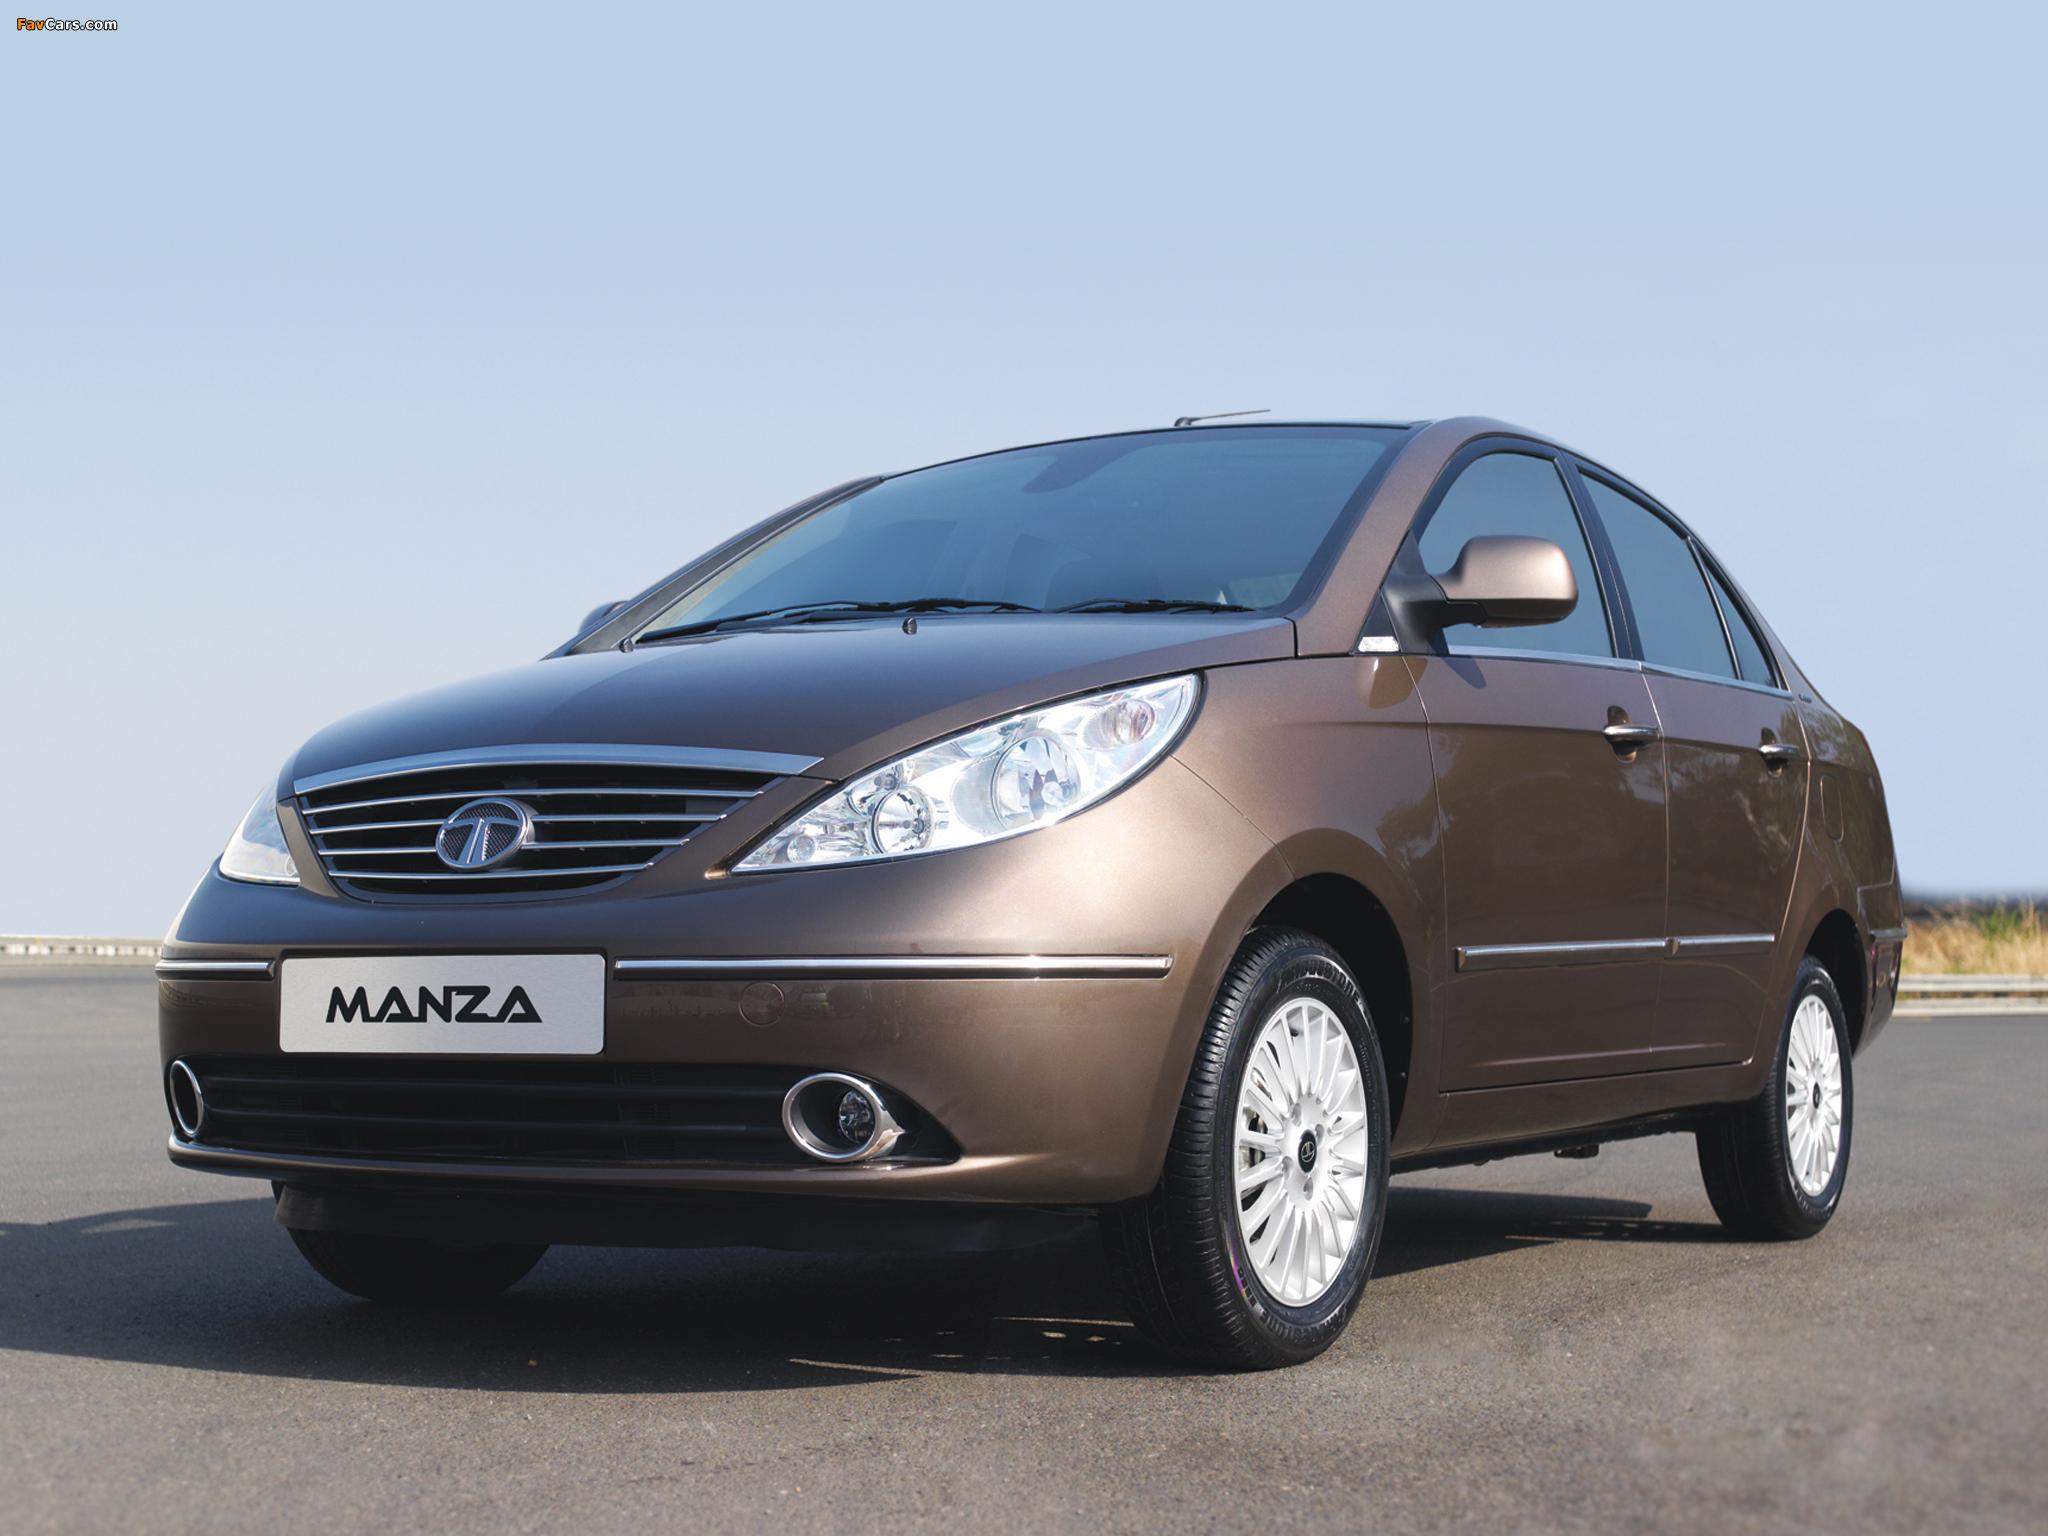 Tata Indigo Manza Nova Concept 2012 wallpapers (2048 x 1536)